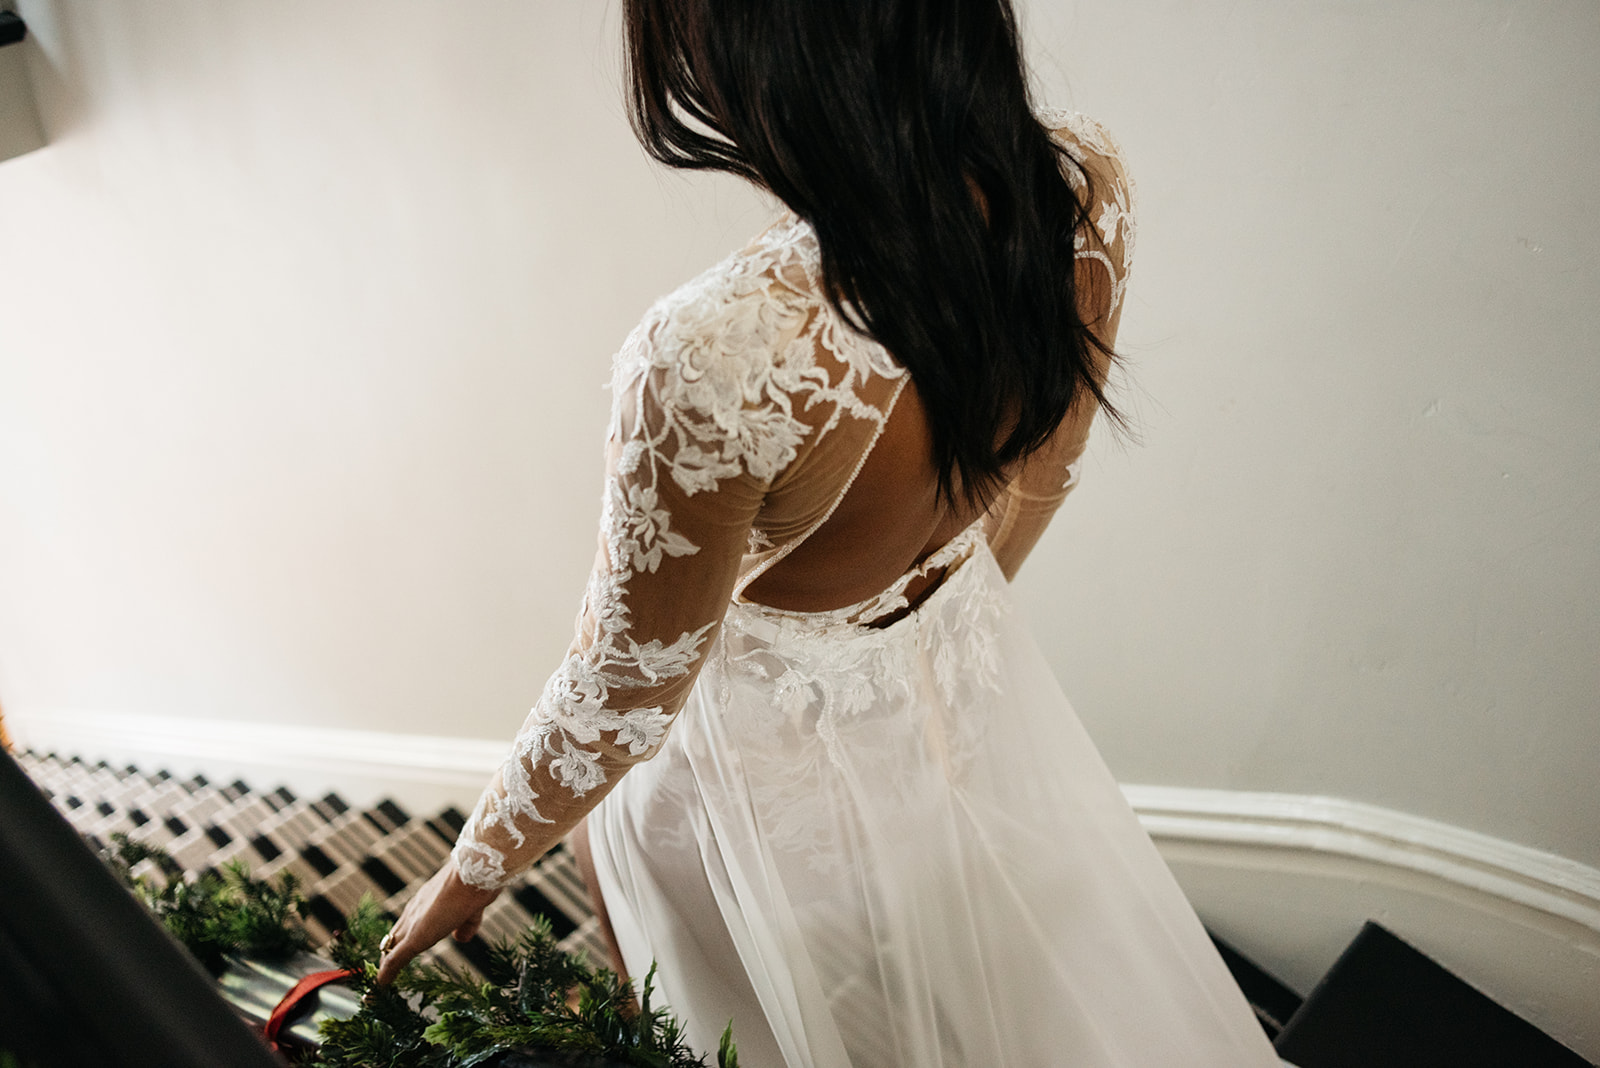 carmen salazar photography, christi reynolds beauty, events by rebecca, sacramento wedding makeup, sacramento weddings